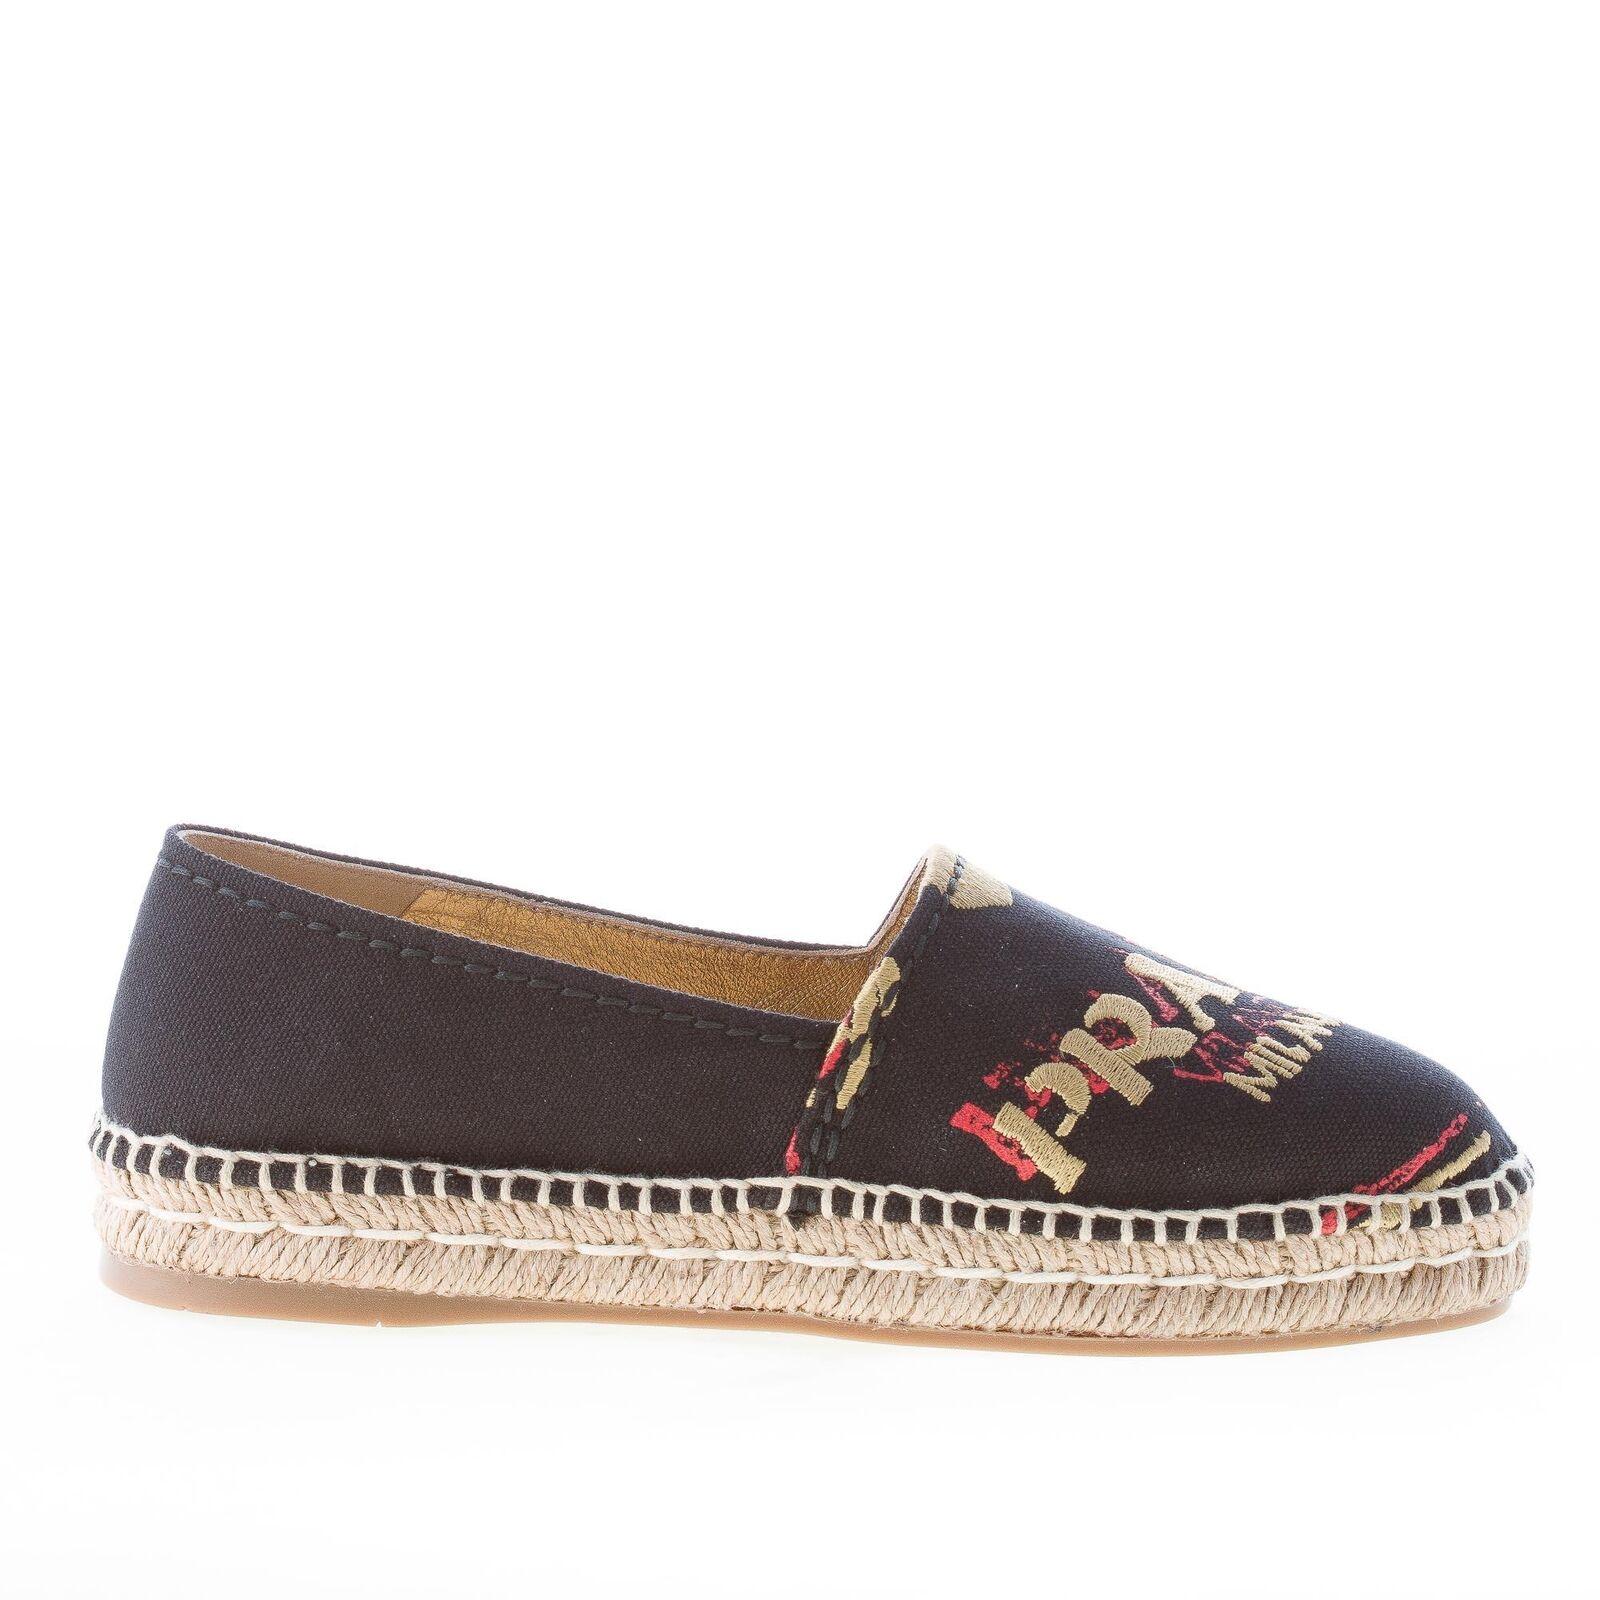 PRADA damen schuhe women shoes Black hemp espadrillas slip on with raffia 1S292H